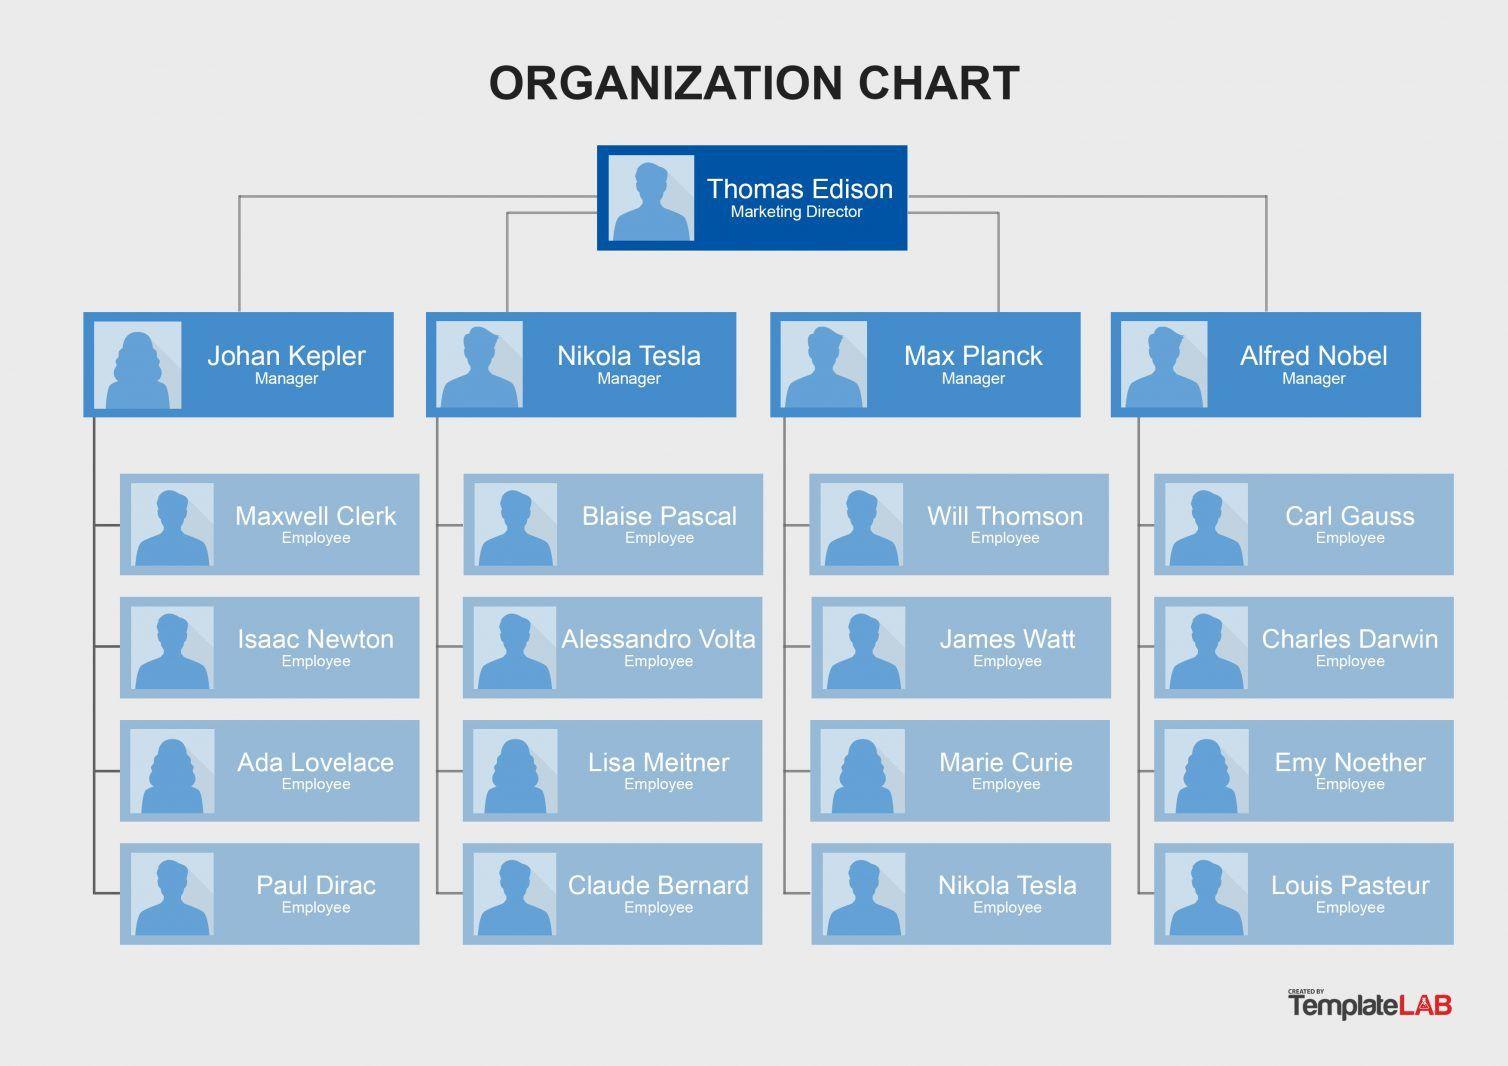 007 Remarkable Organization Chart Template Excel 2010 High Def  Org OrganizationalFull